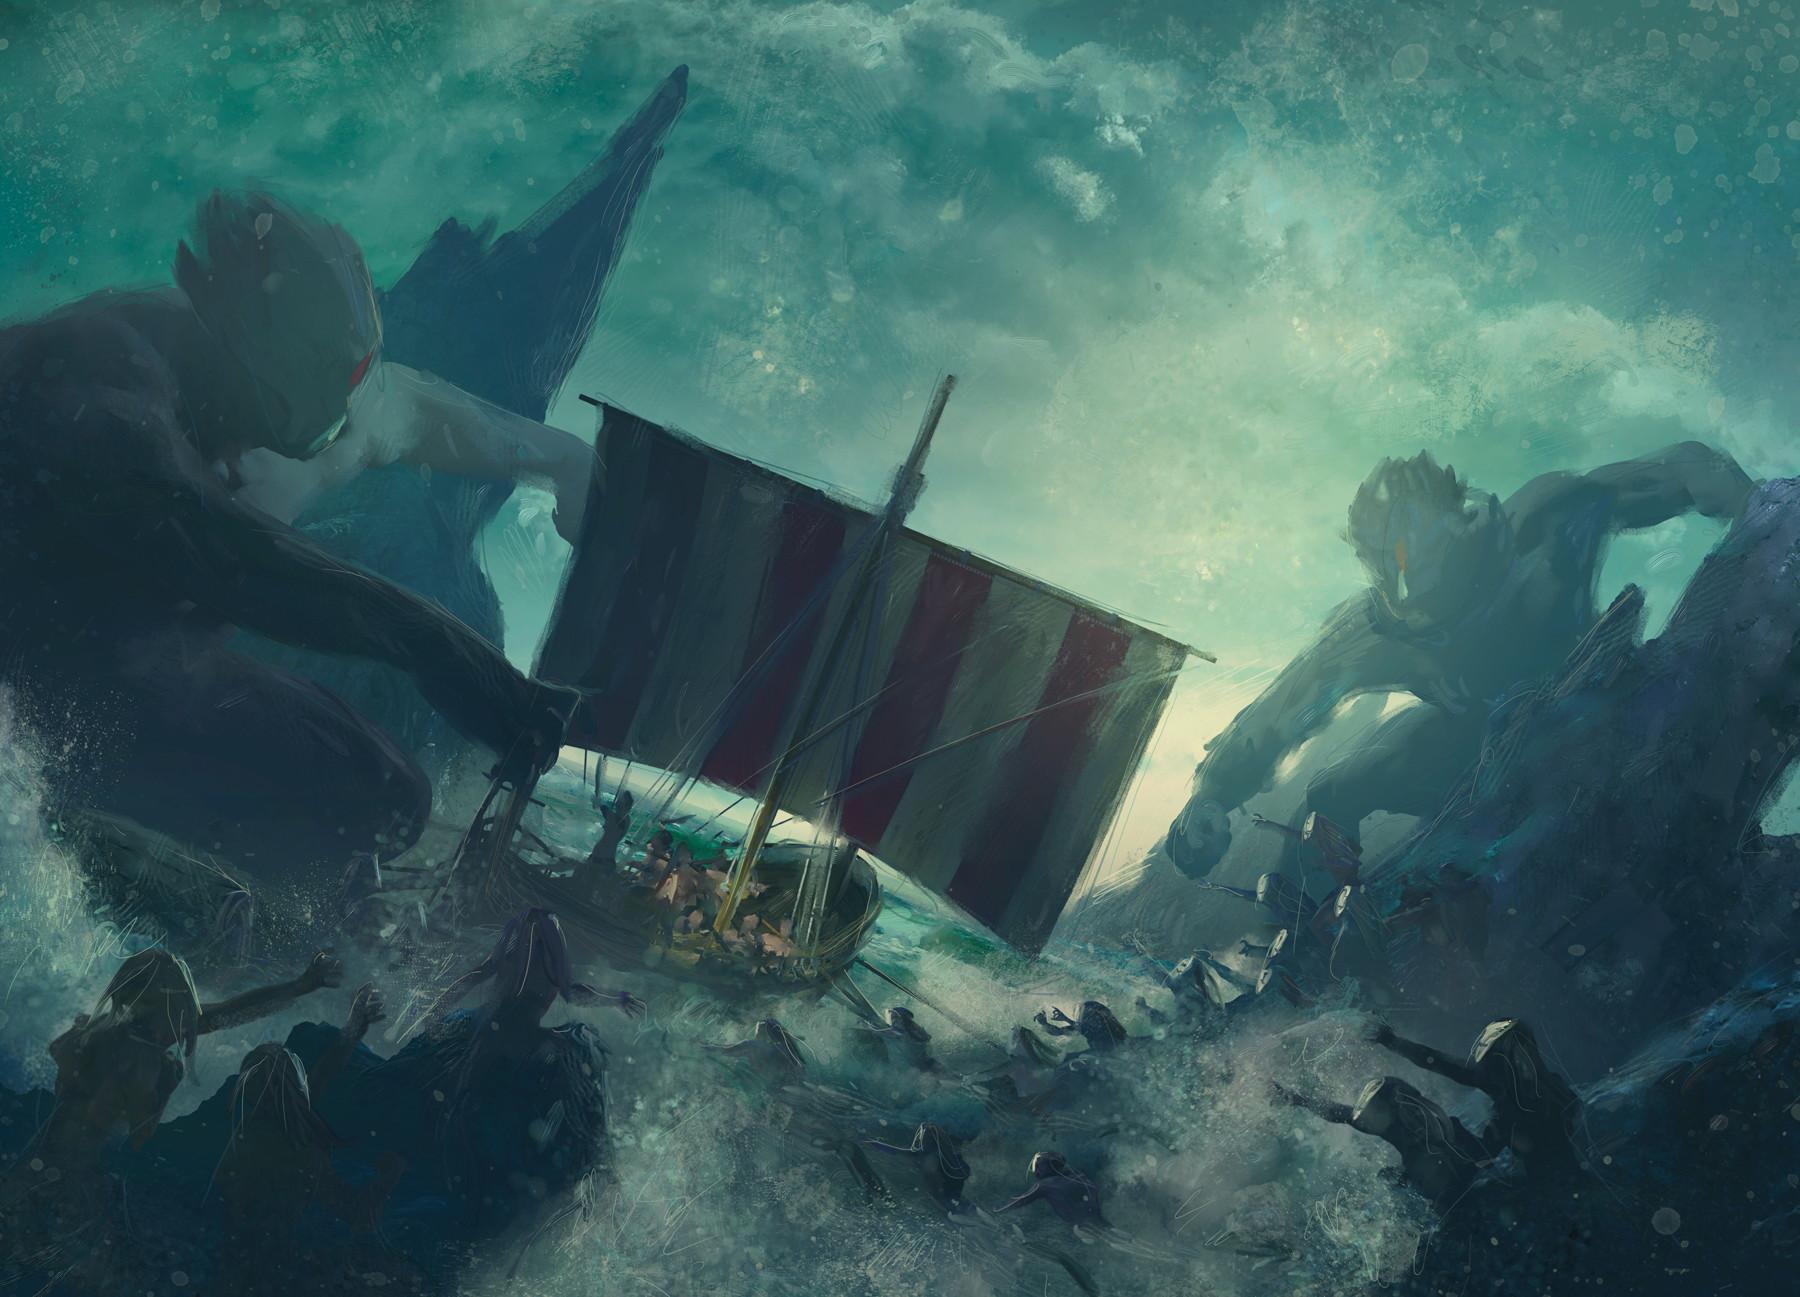 Guillem h pongiluppi board cover mythic battles poseidon concept3